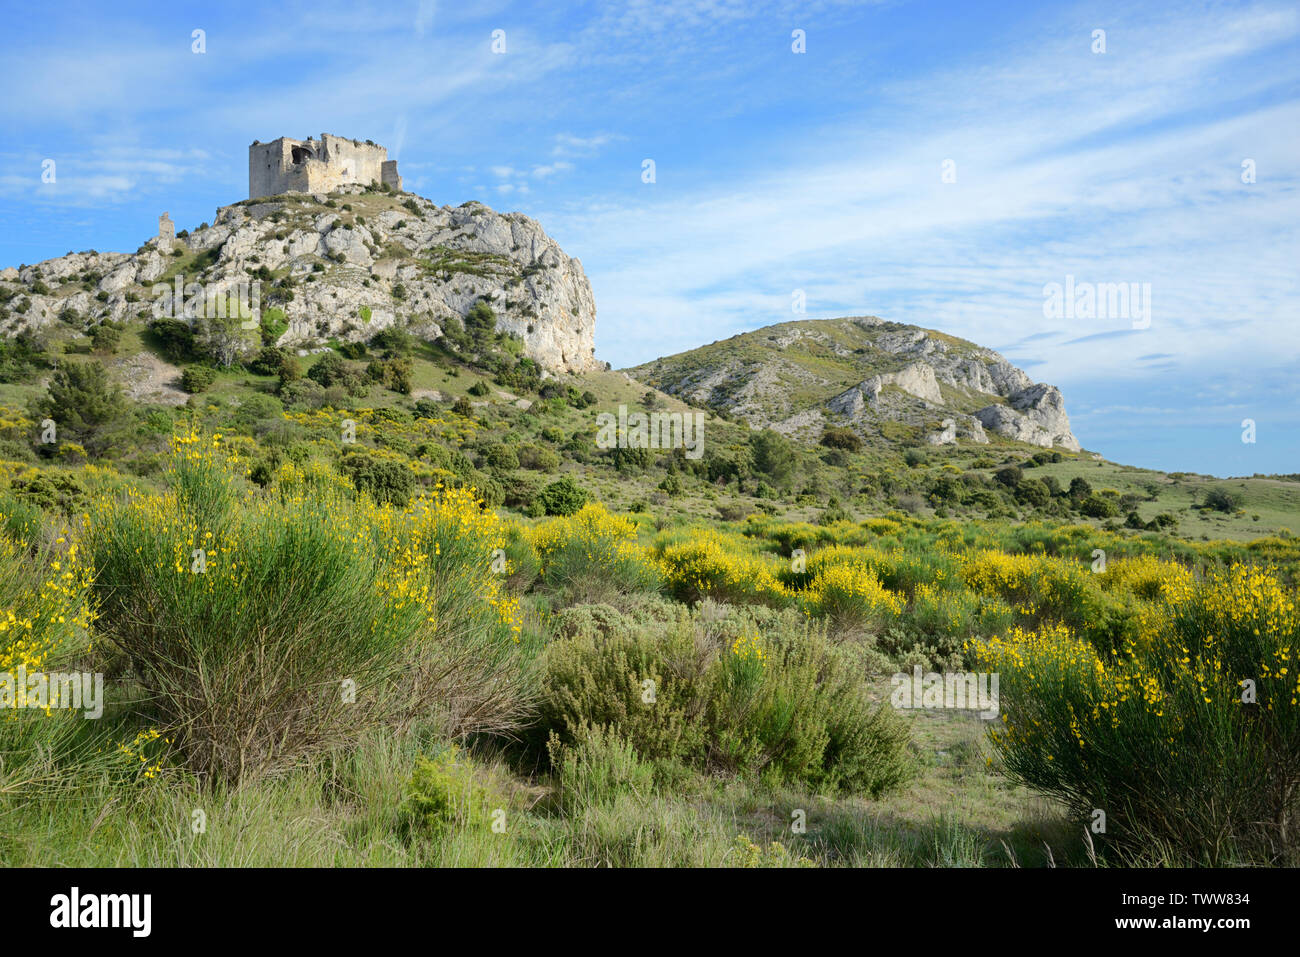 Flowering Bloom, Cytisus scoparius, & Maquis Below the Castellas de Roquemartine Ruined Castle, c12th-c13th, Eyguières Les Alpilles Provence France - Stock Image